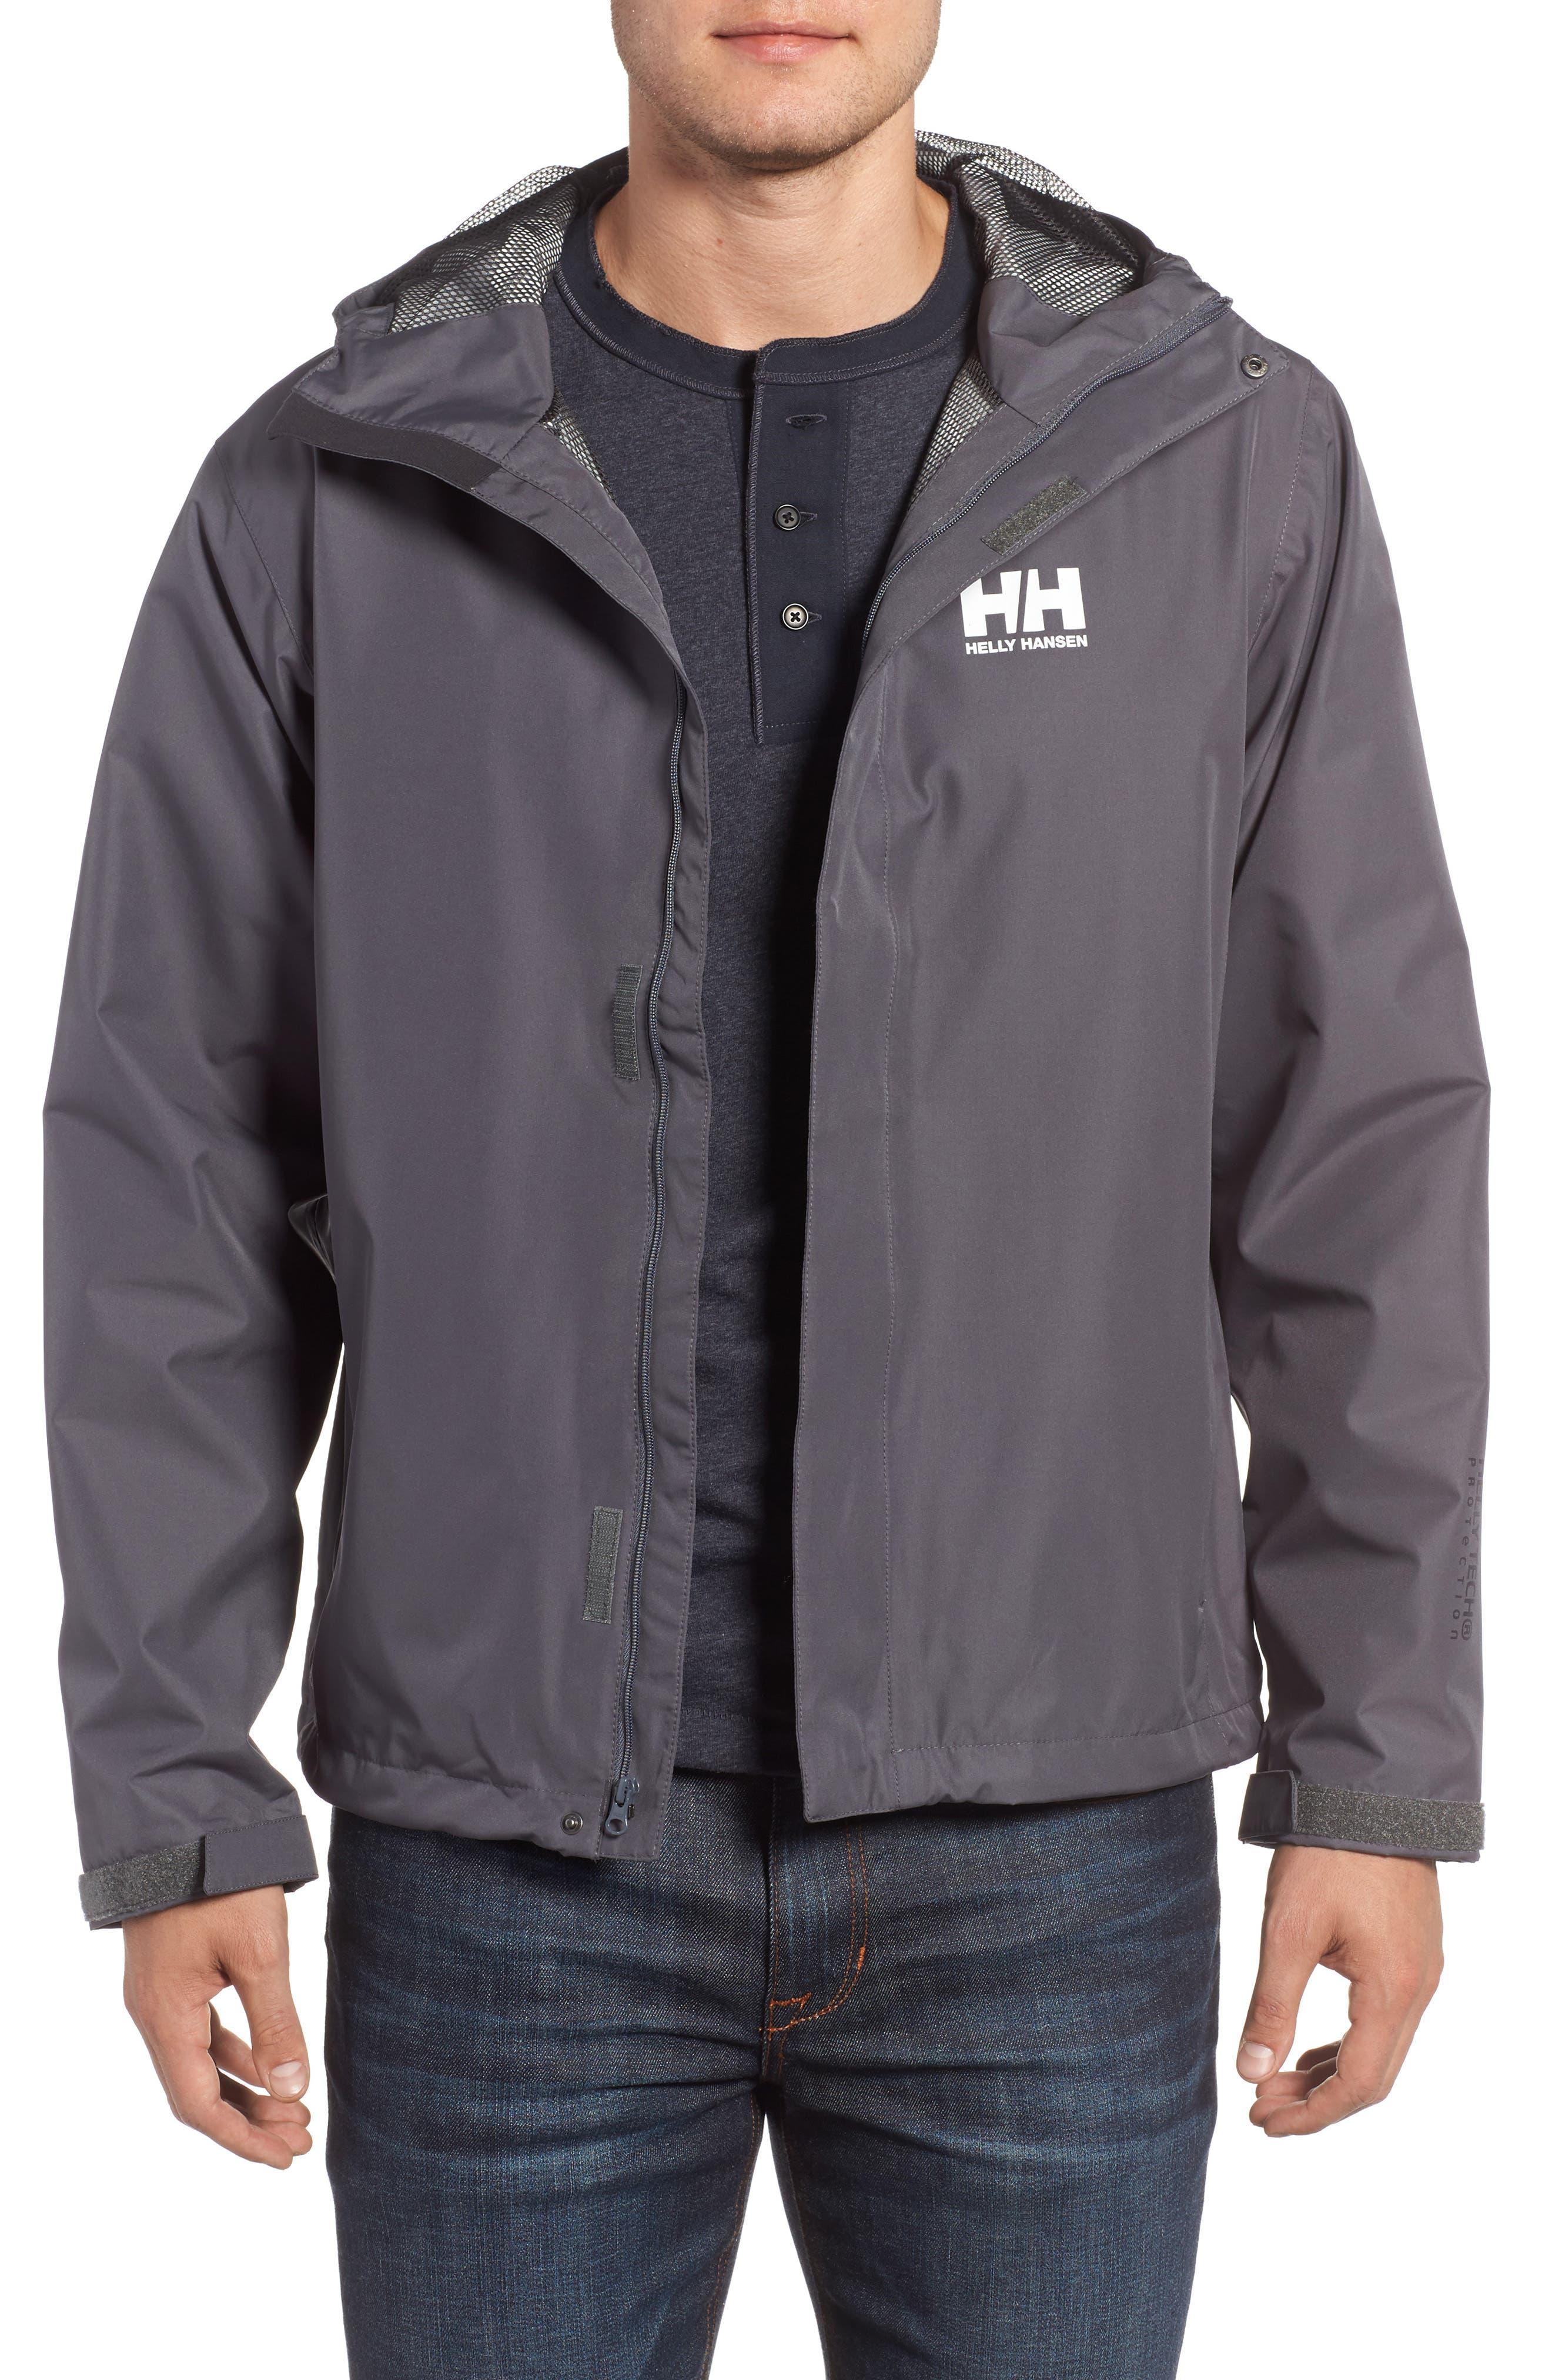 Helly Hansen 'Seven J' Waterproof & Windproof Jacket